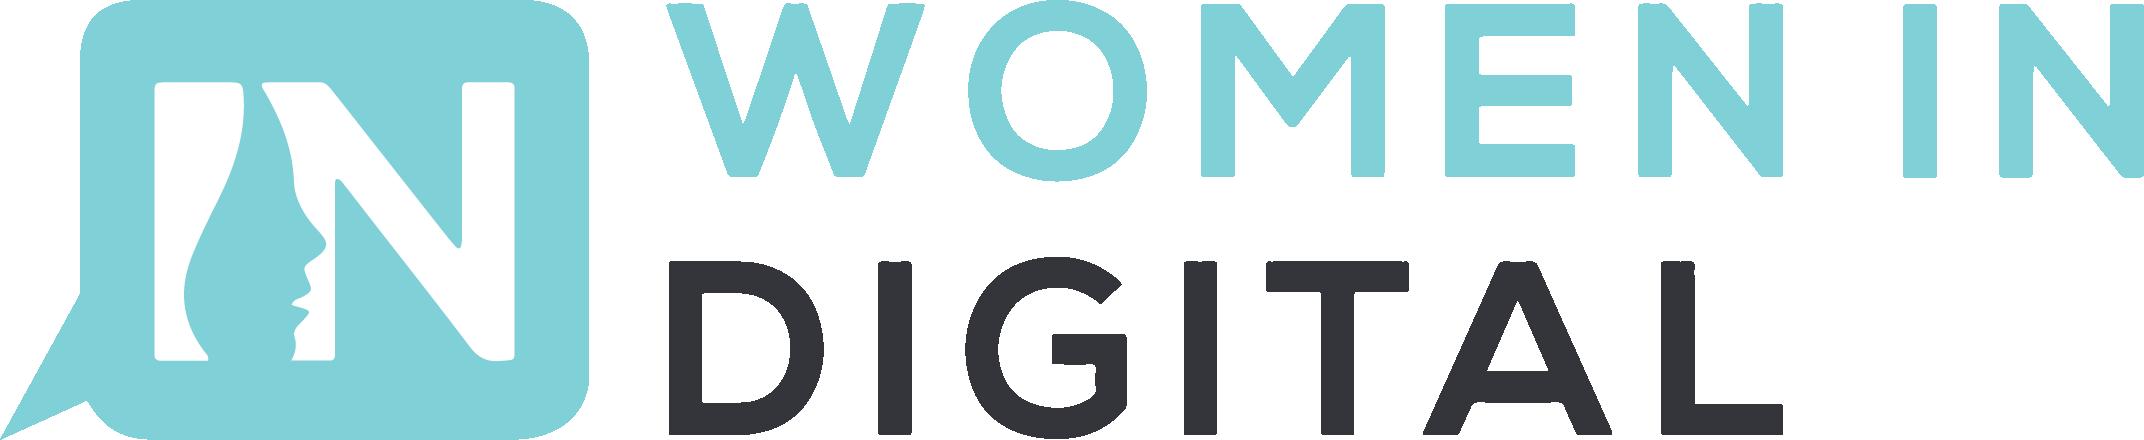 womenindigitalusa-410-logo.png